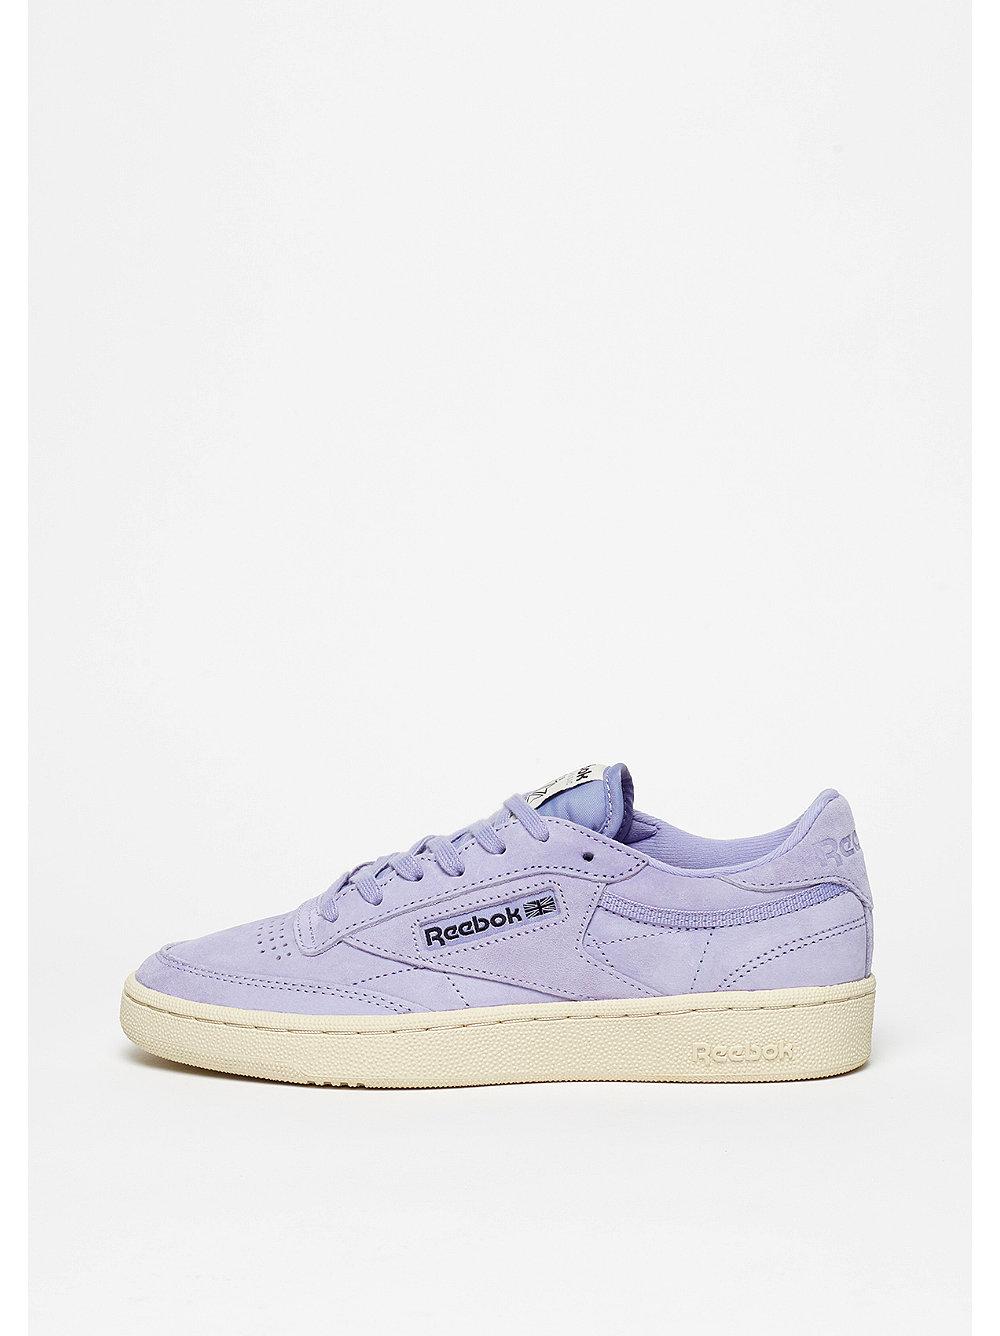 Reebok Schuh Club C 85 Pastels moon violet/pape...